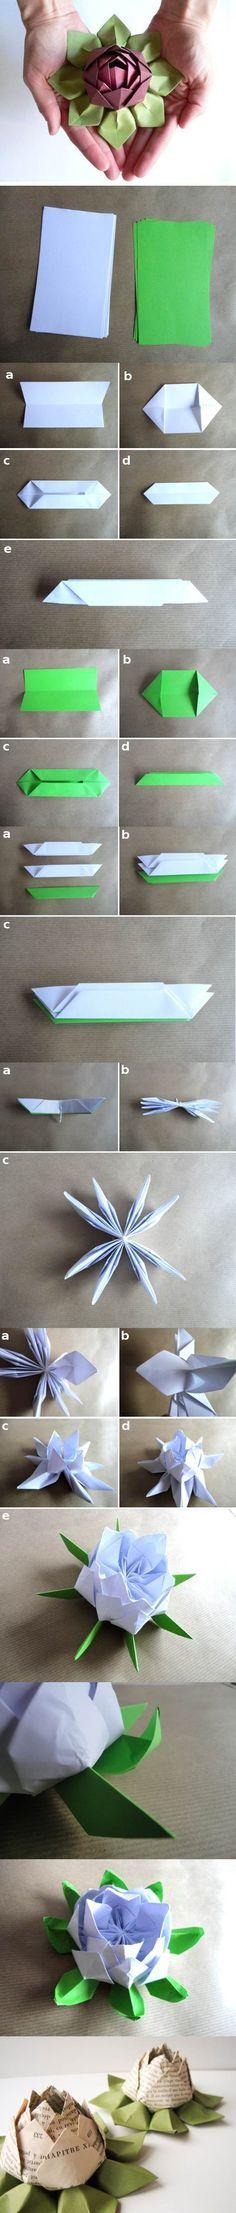 DIY Origami Lotus Flower   iCreativeIdeas.com Like Us on Facebook ==> https://www.facebook.com/icreativeideas